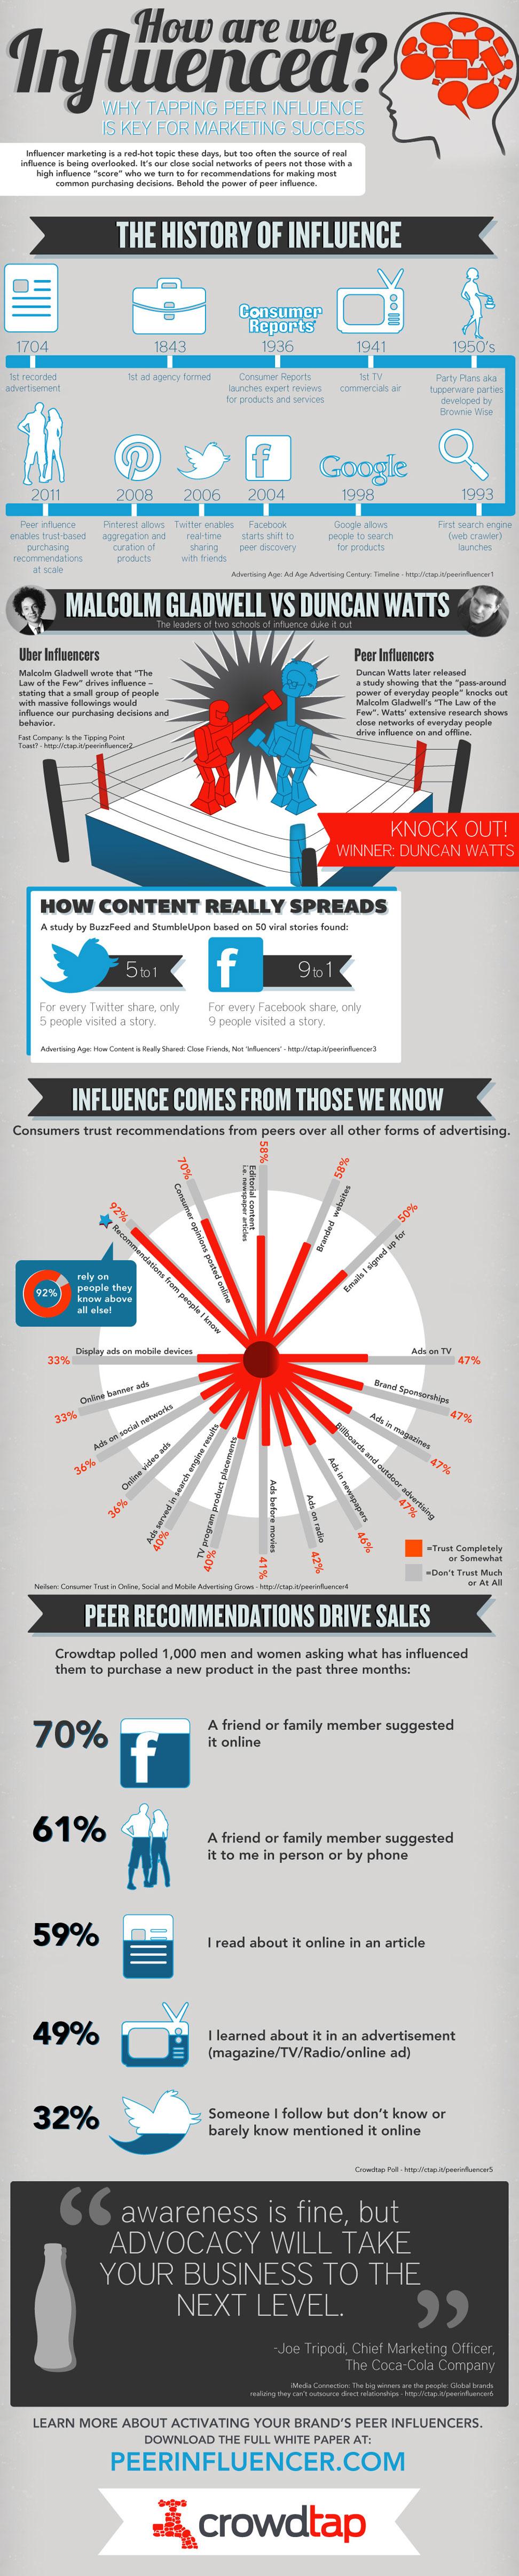 Top Online Marketing News June 15, 2012